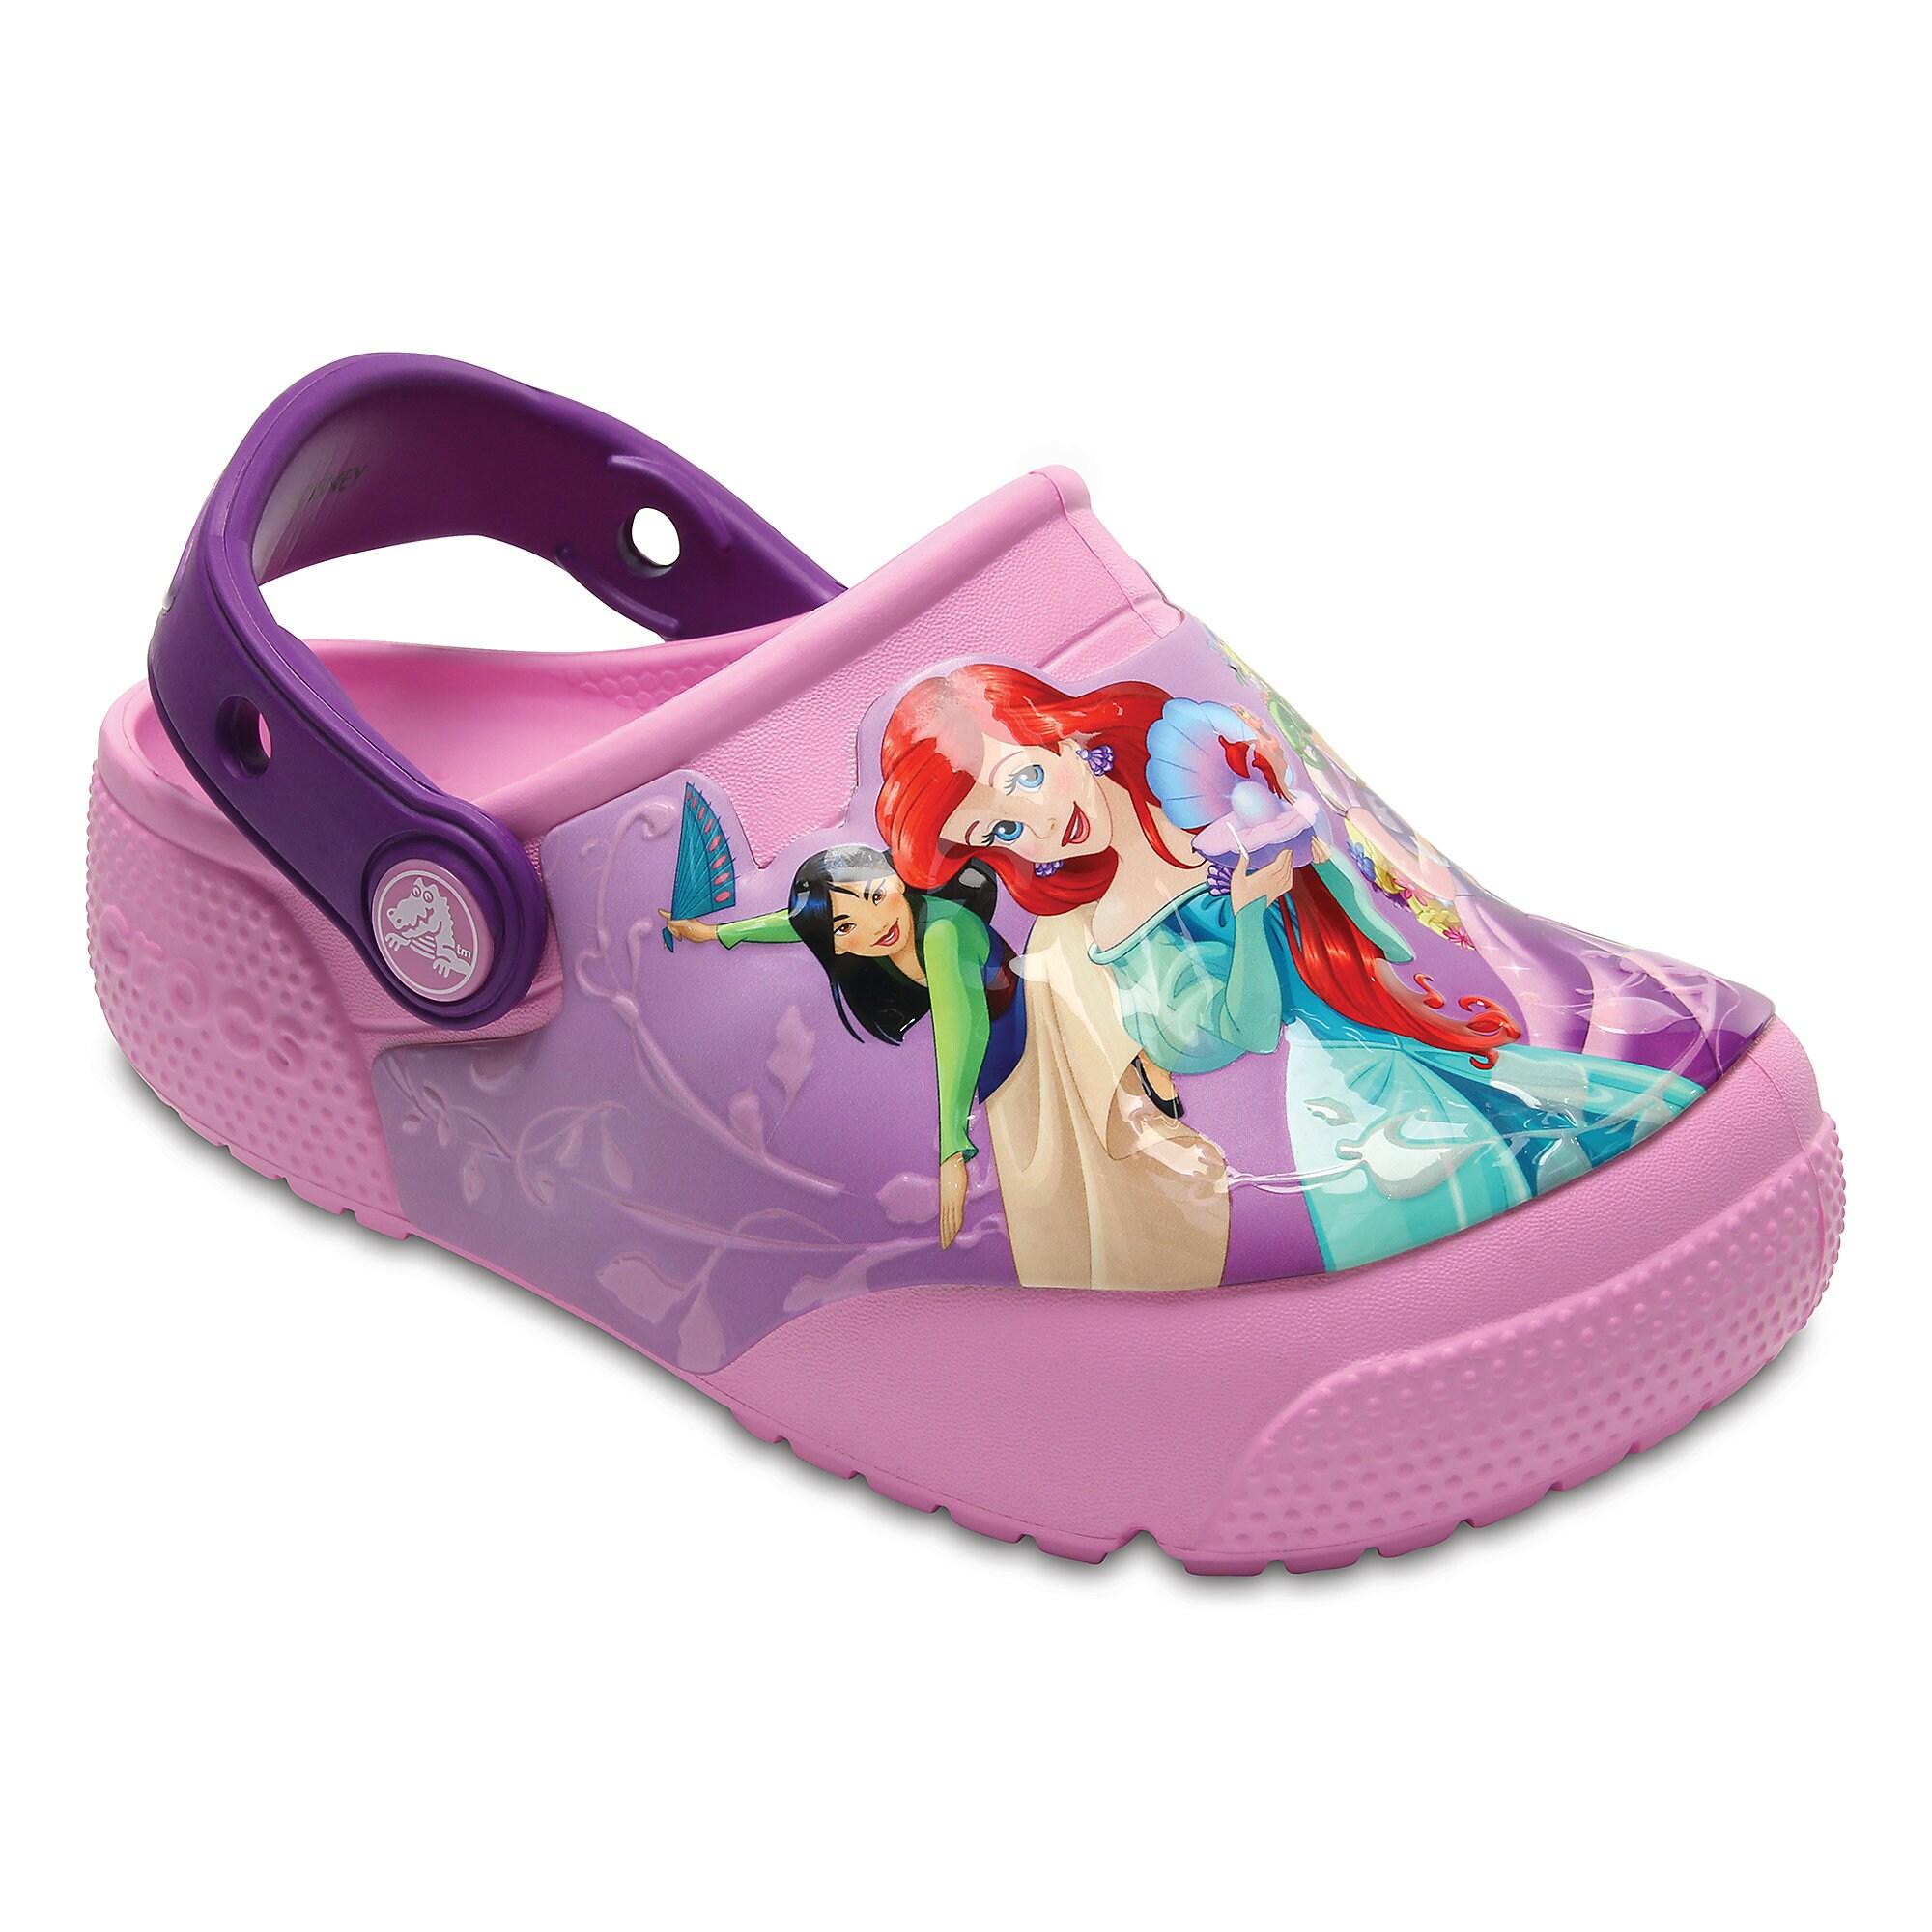 751fba856abd3d Disney Princess Light-Up Clogs for Kids by Crocs